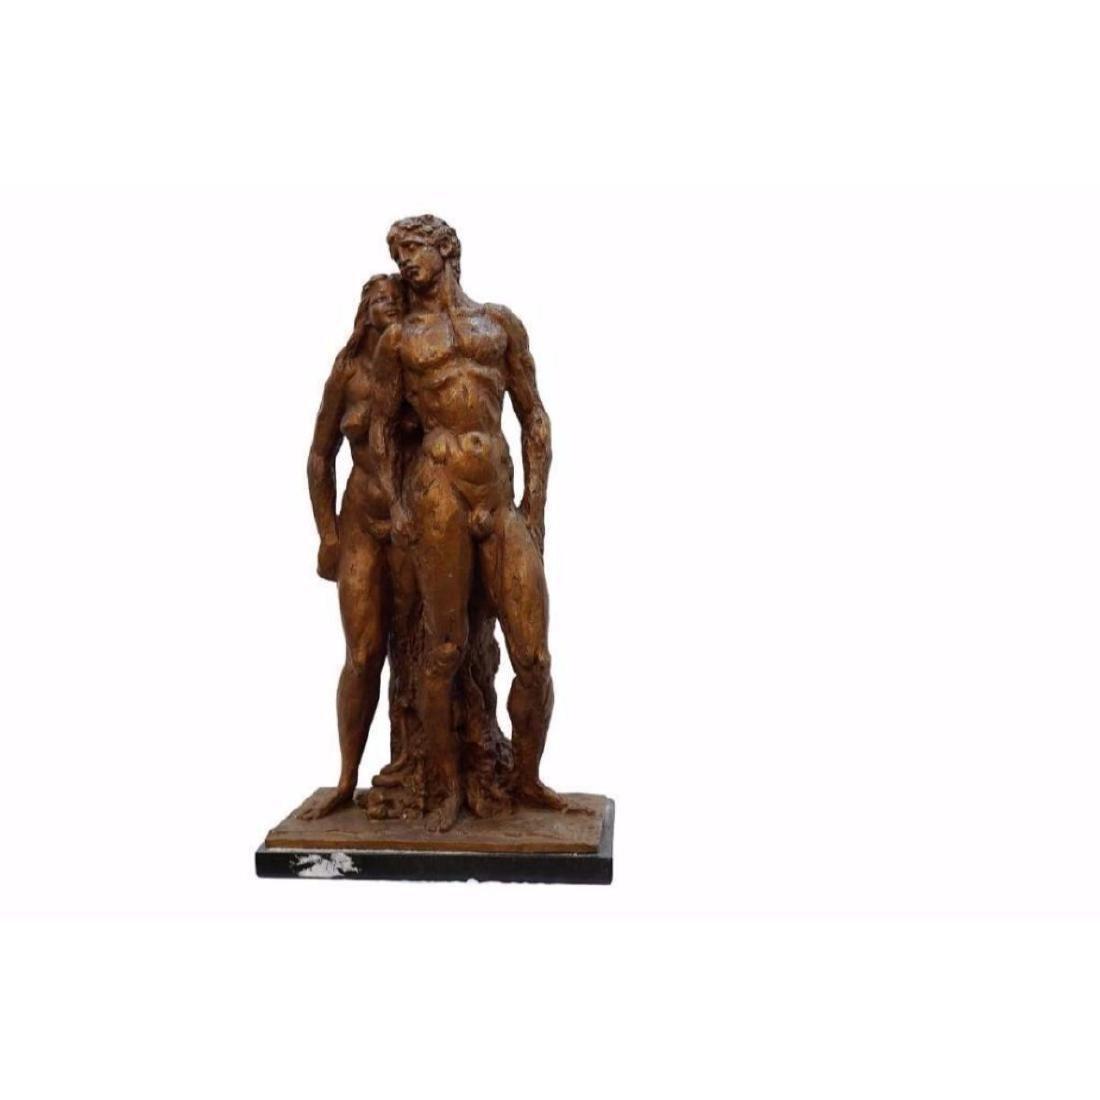 ORIGINAL AND RARE: Gulaberto Rocchi Signed Bronze